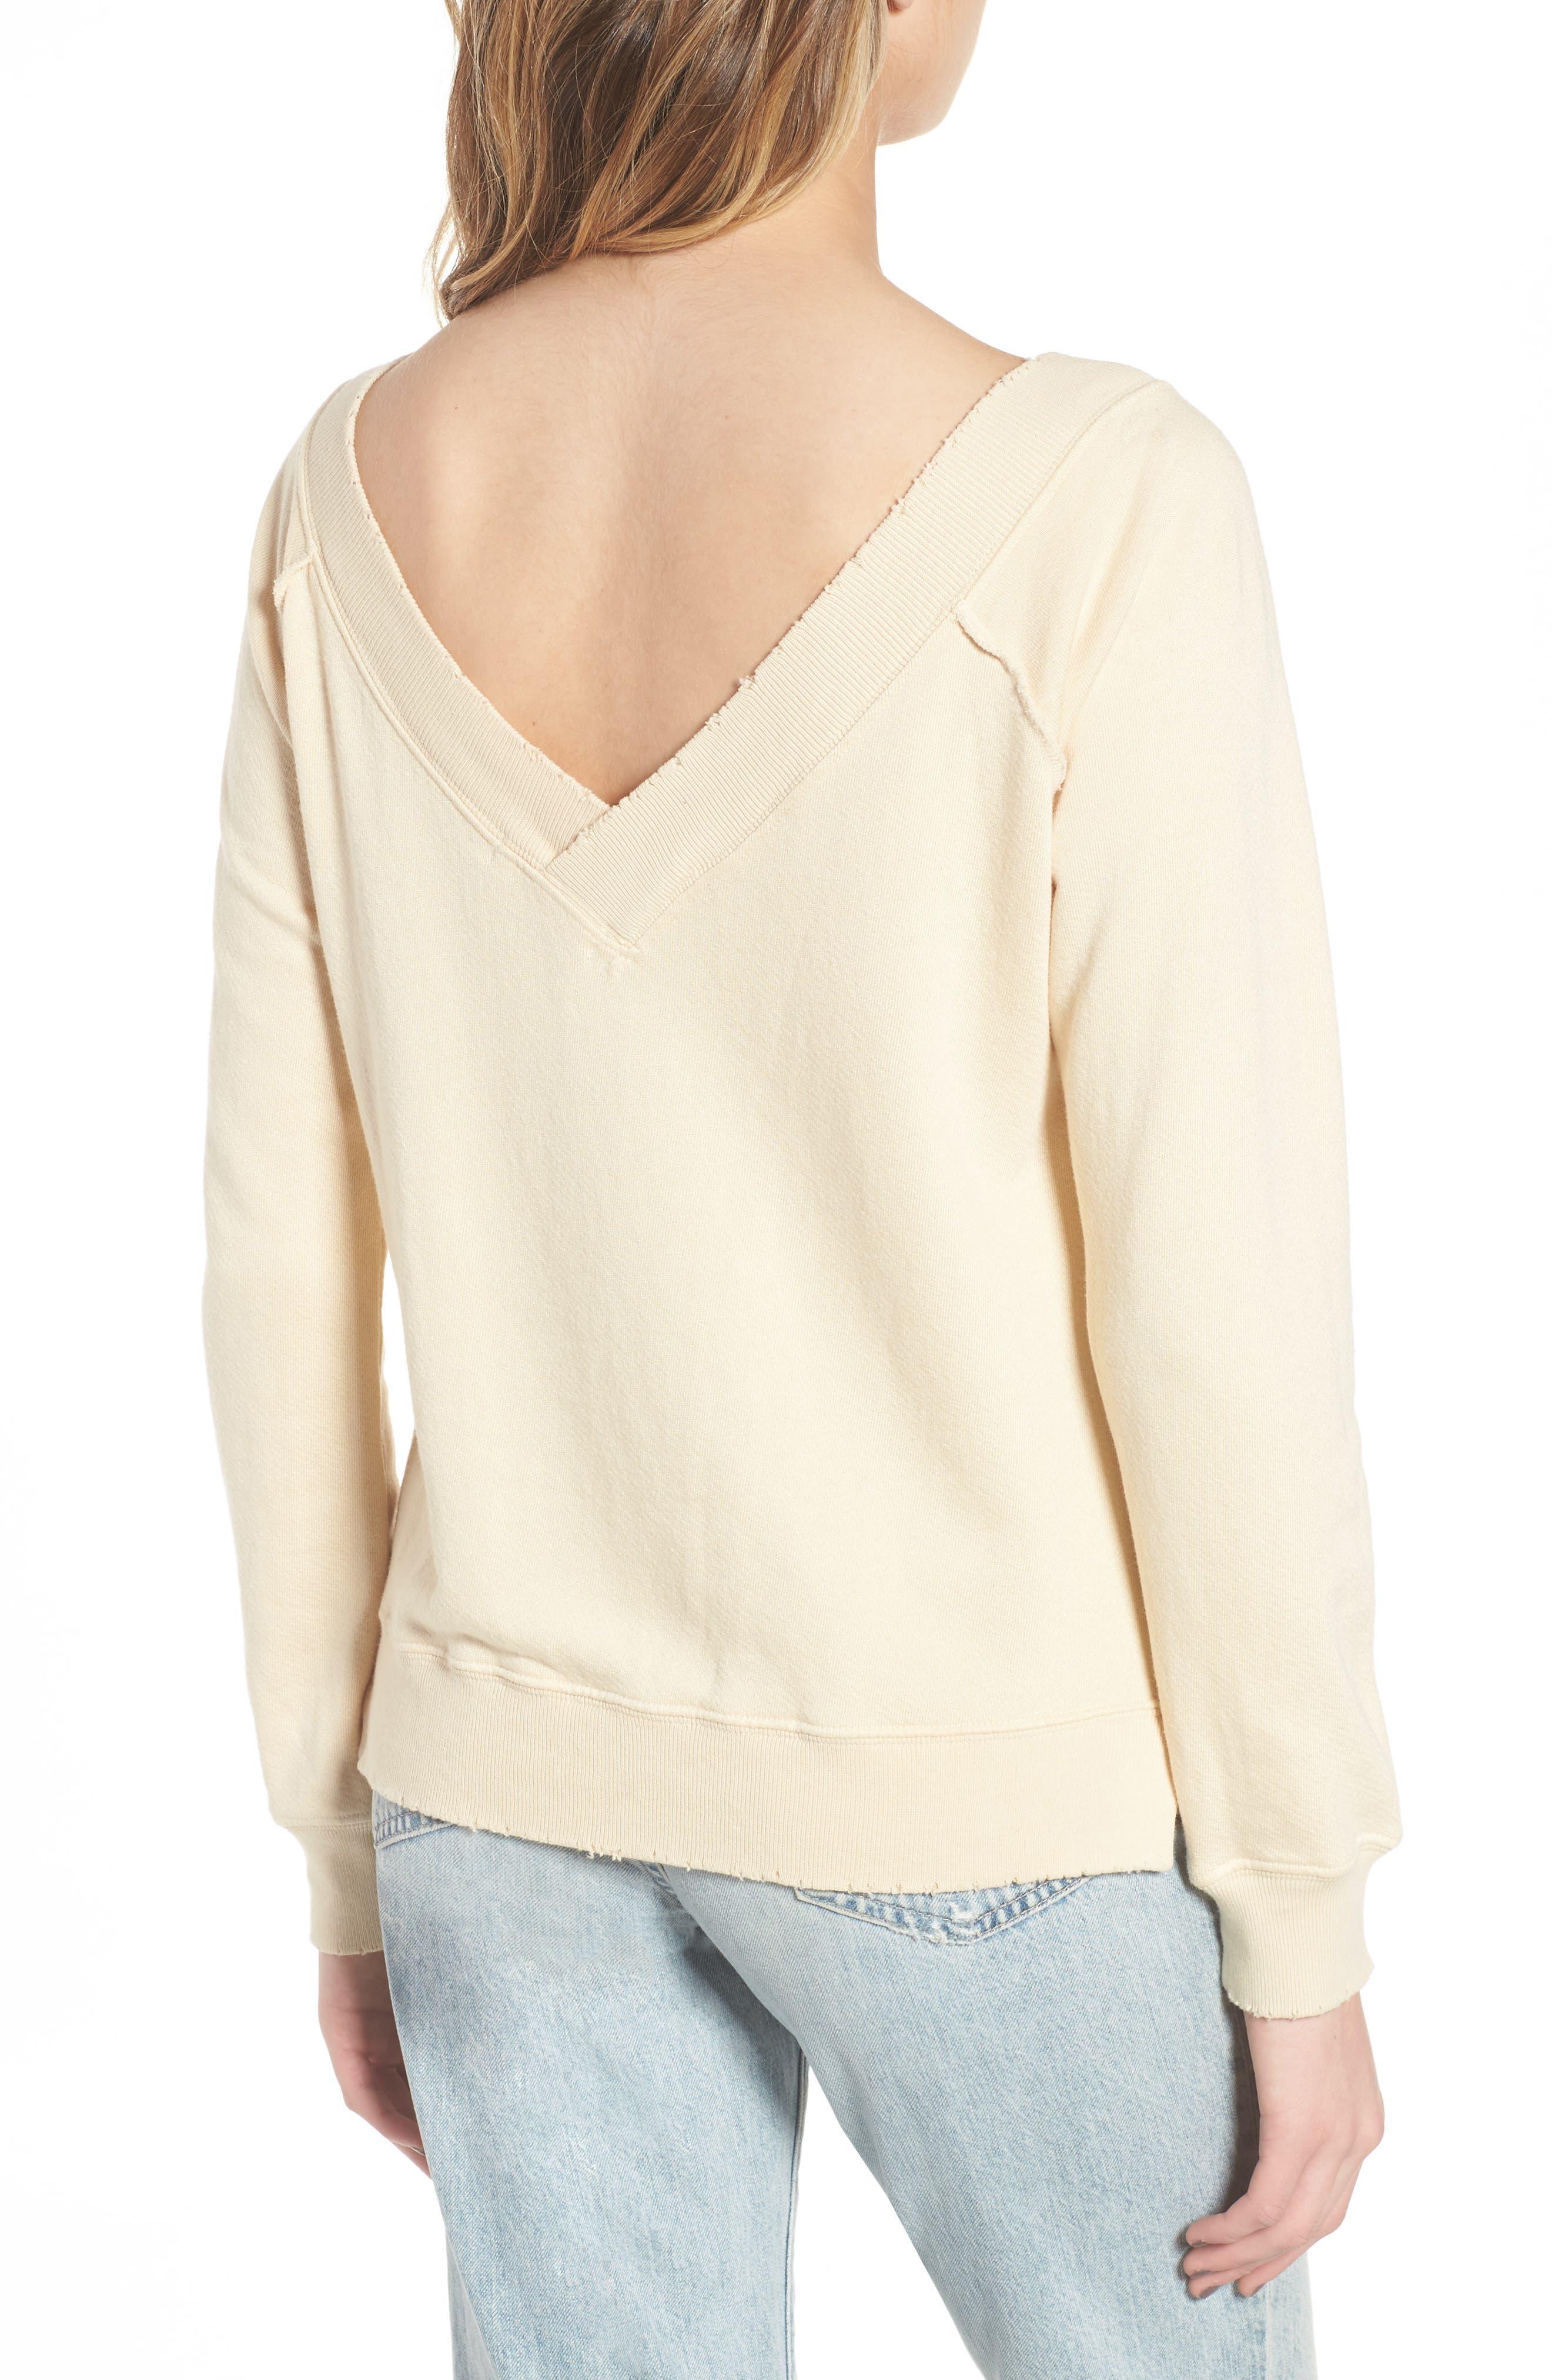 Mayer V-Neck Sweatshirt,                             Alternate thumbnail 2, color,                             Citrus Dust